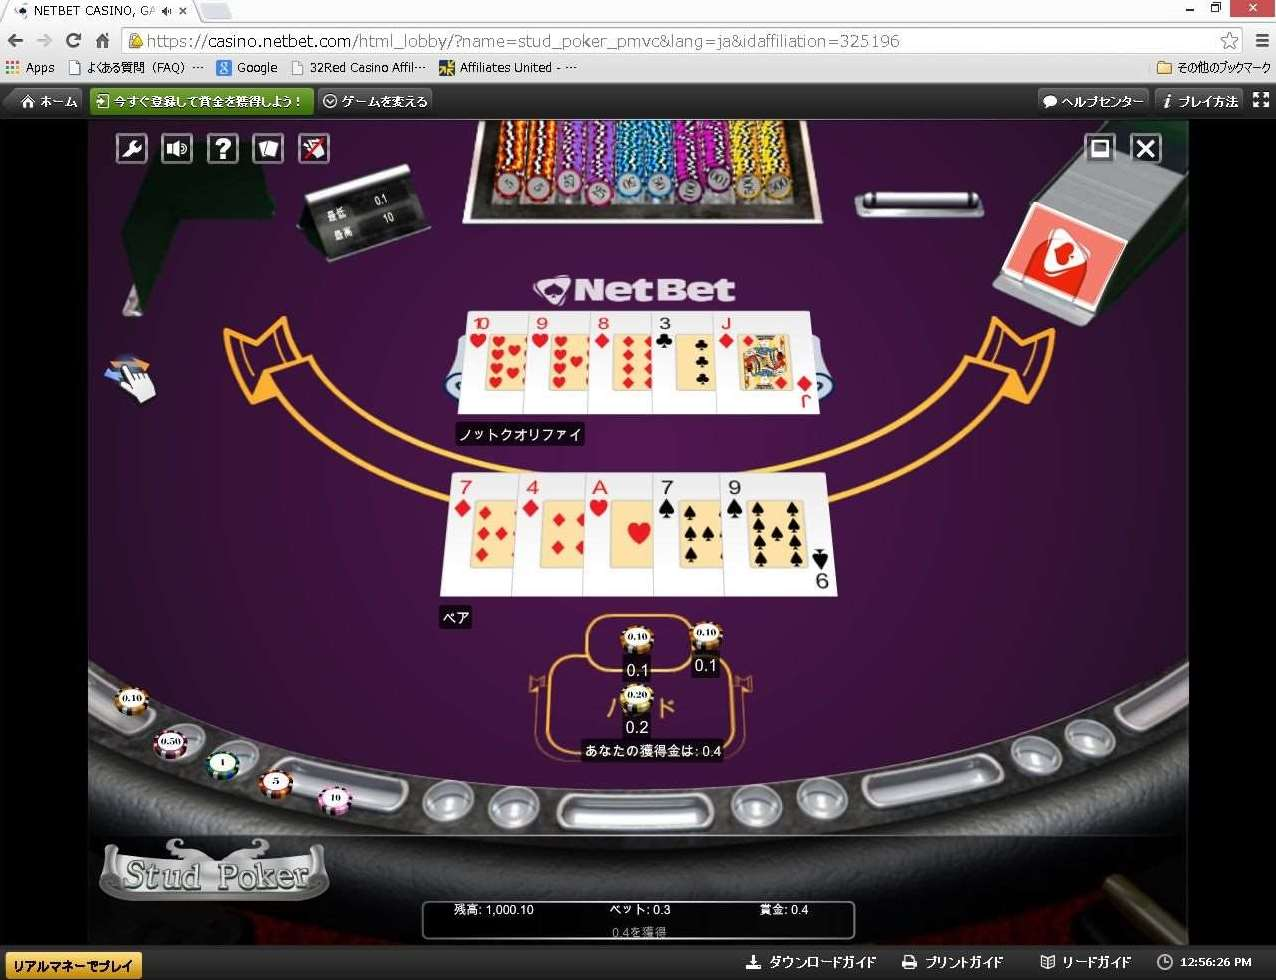 NetBet Stud Poker